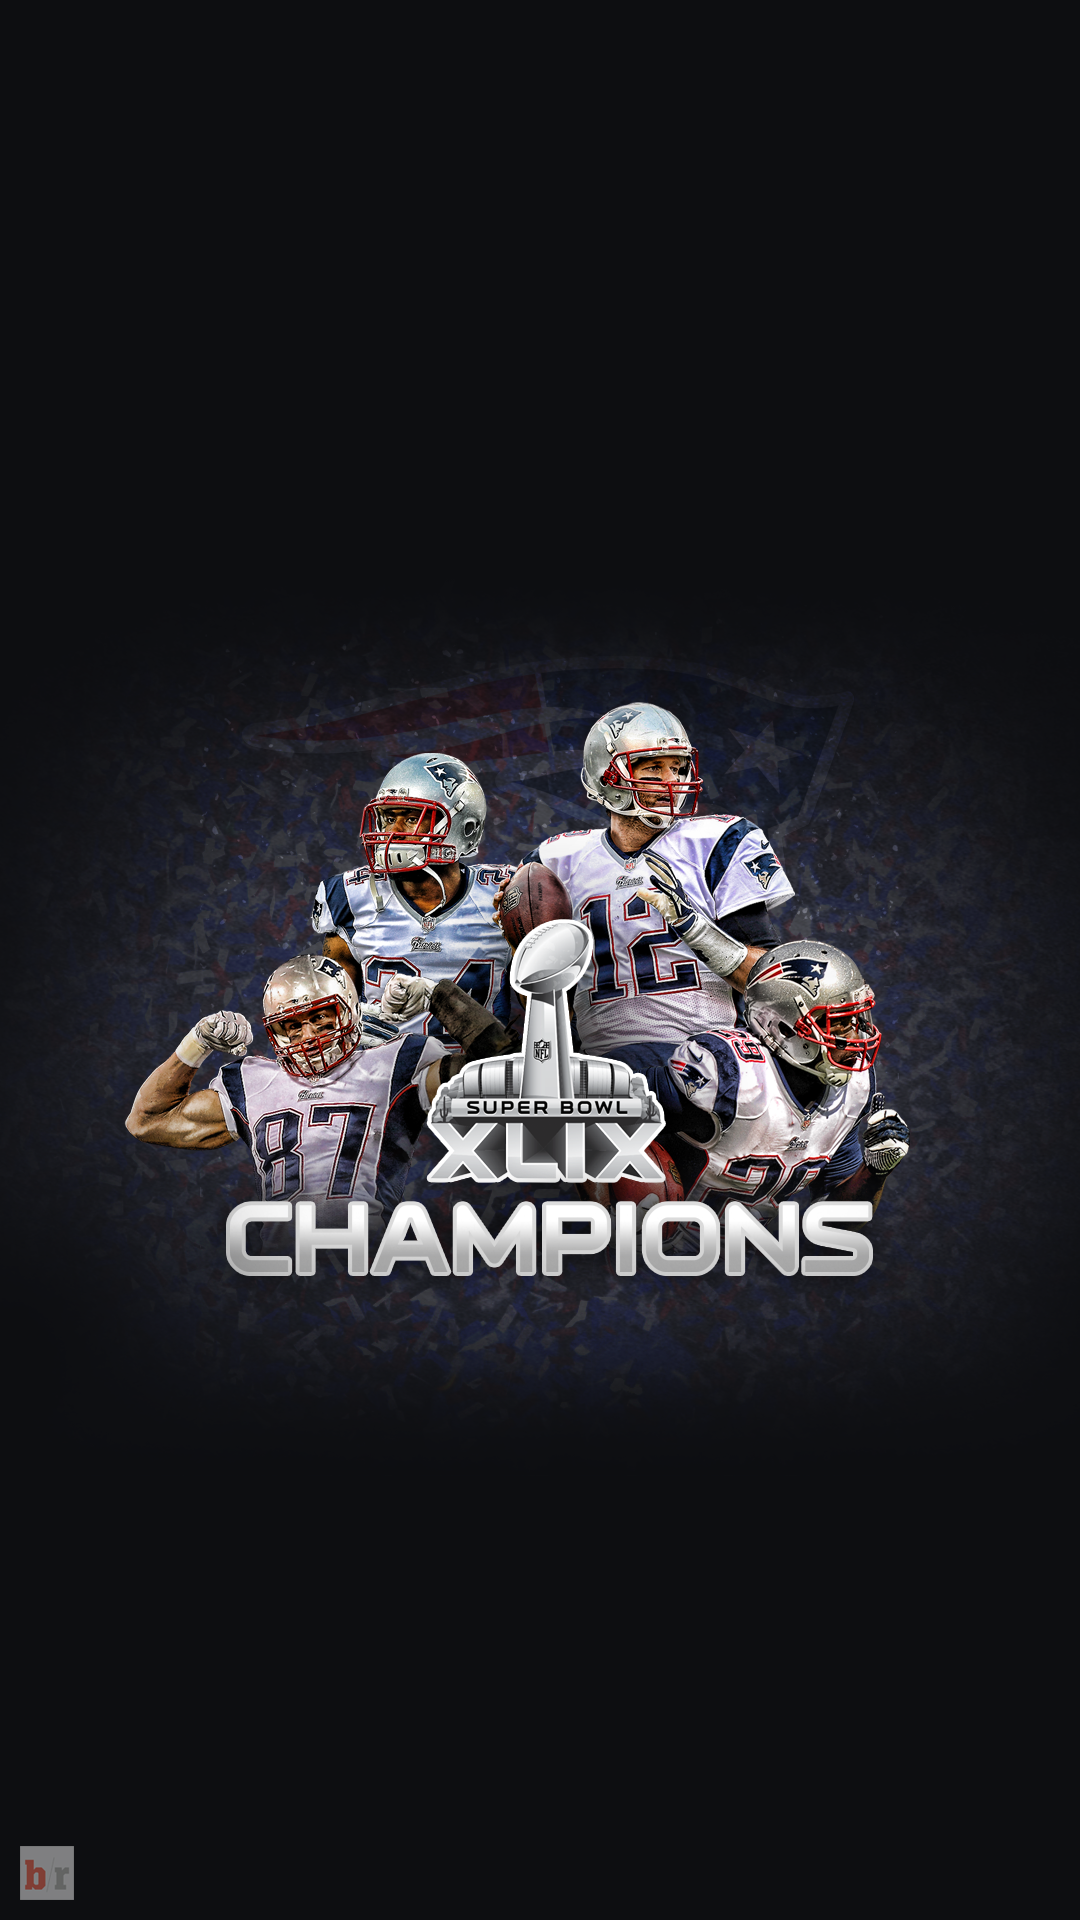 Pokemon New England Patriots - HD Wallpaper